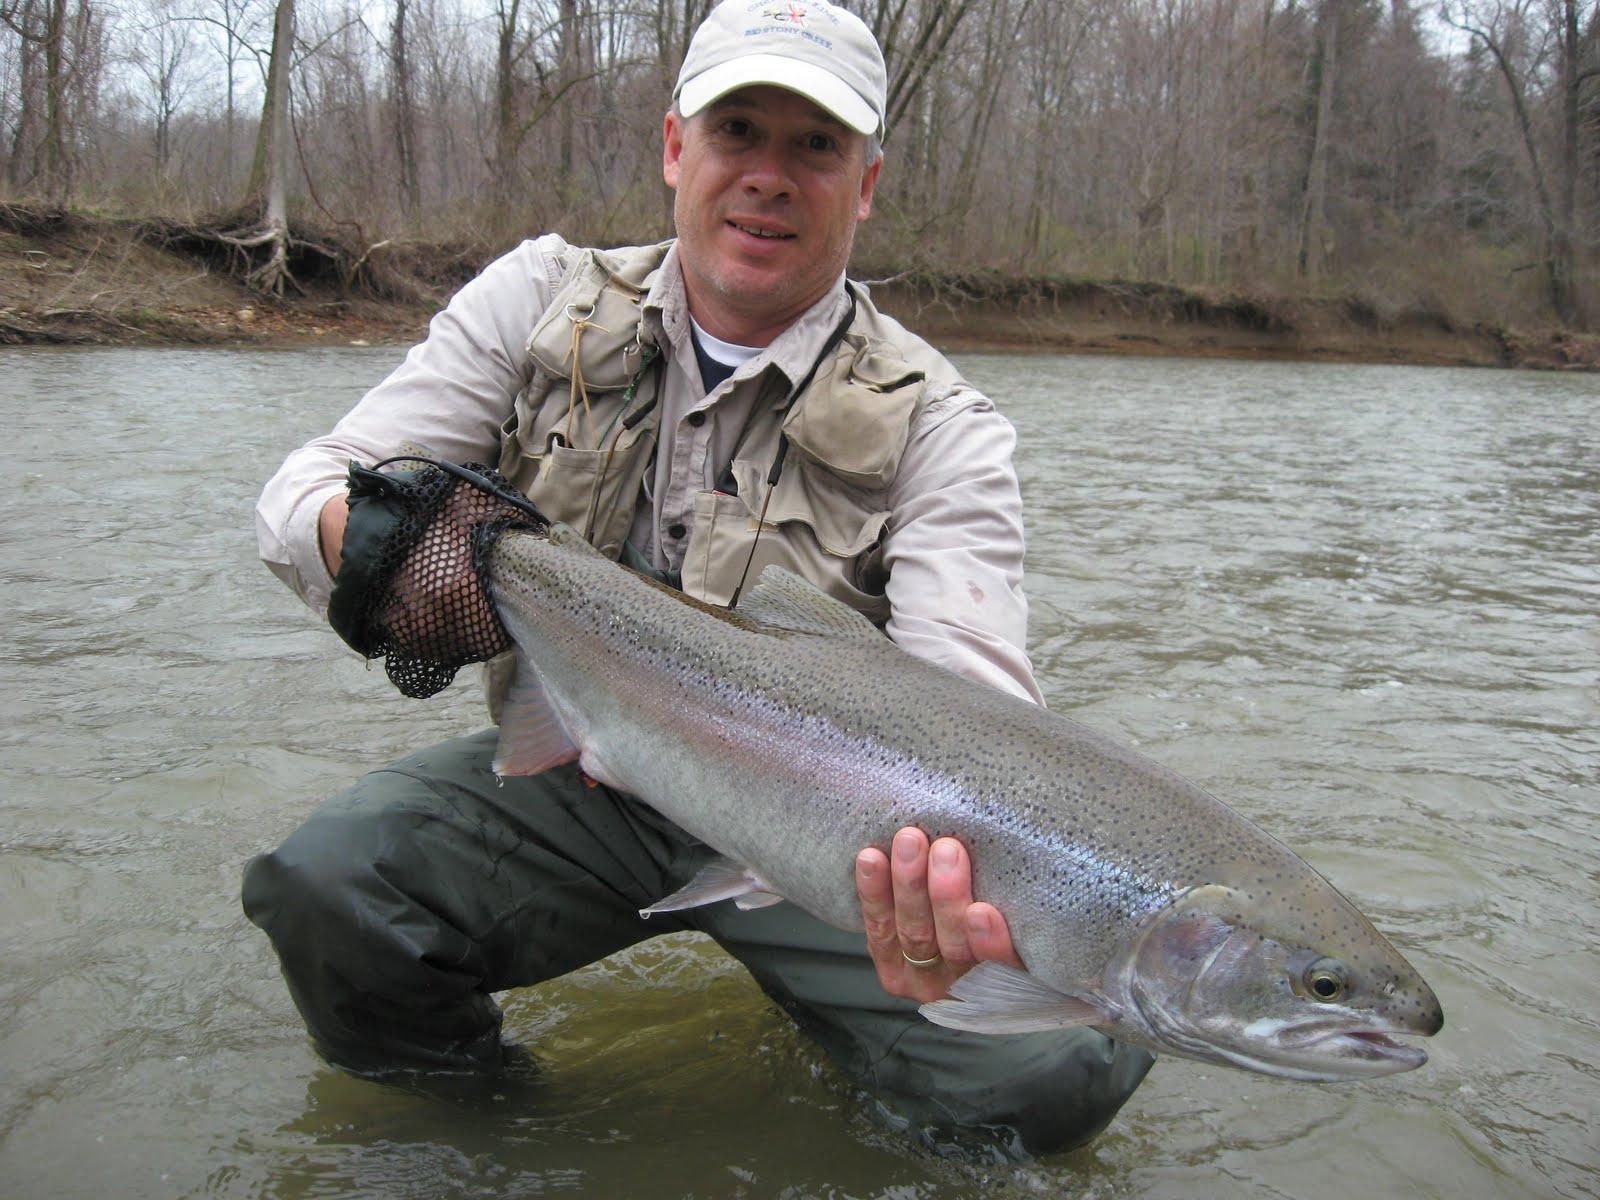 Pa ohio steelhead guides fly fishing reports fly tying for Steelhead fly fishing